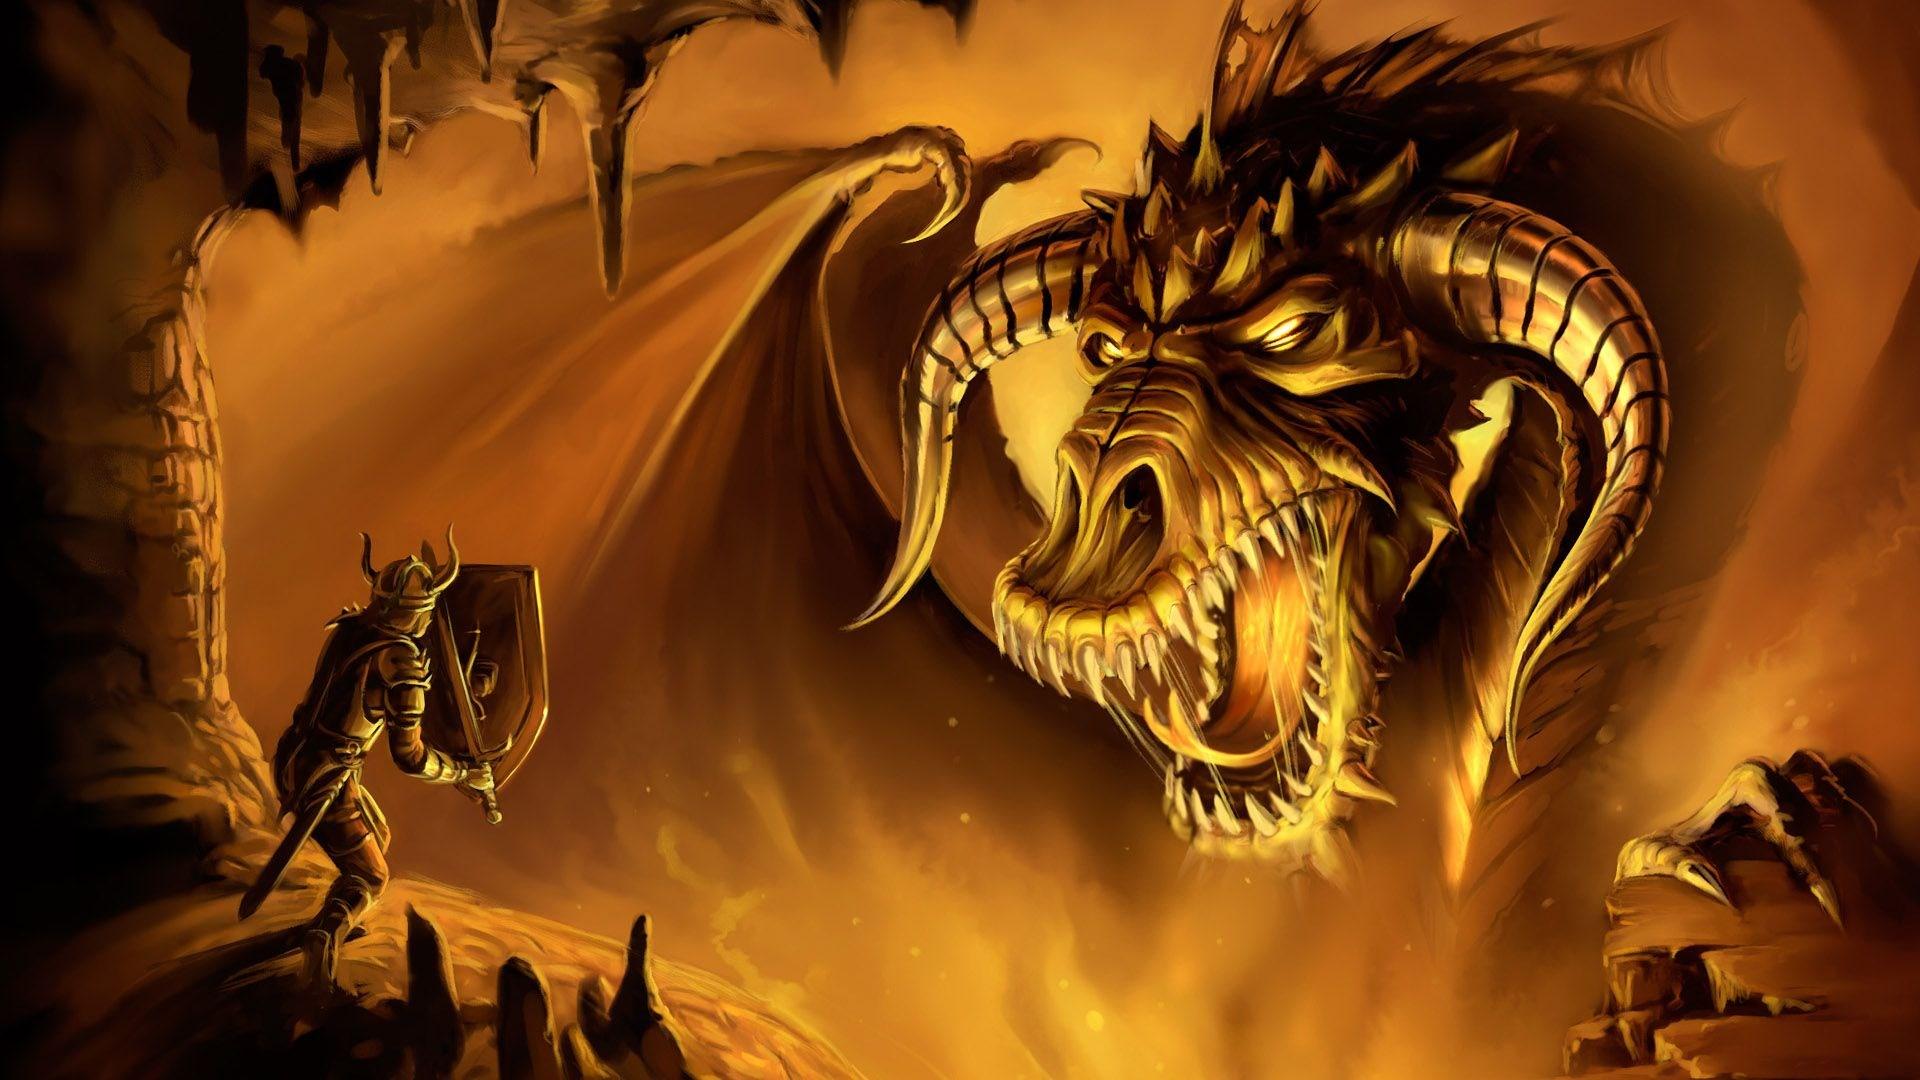 Cooper-Fletcher-Full-size-dragon-1920x1080-px-wallpaper-wp3404218